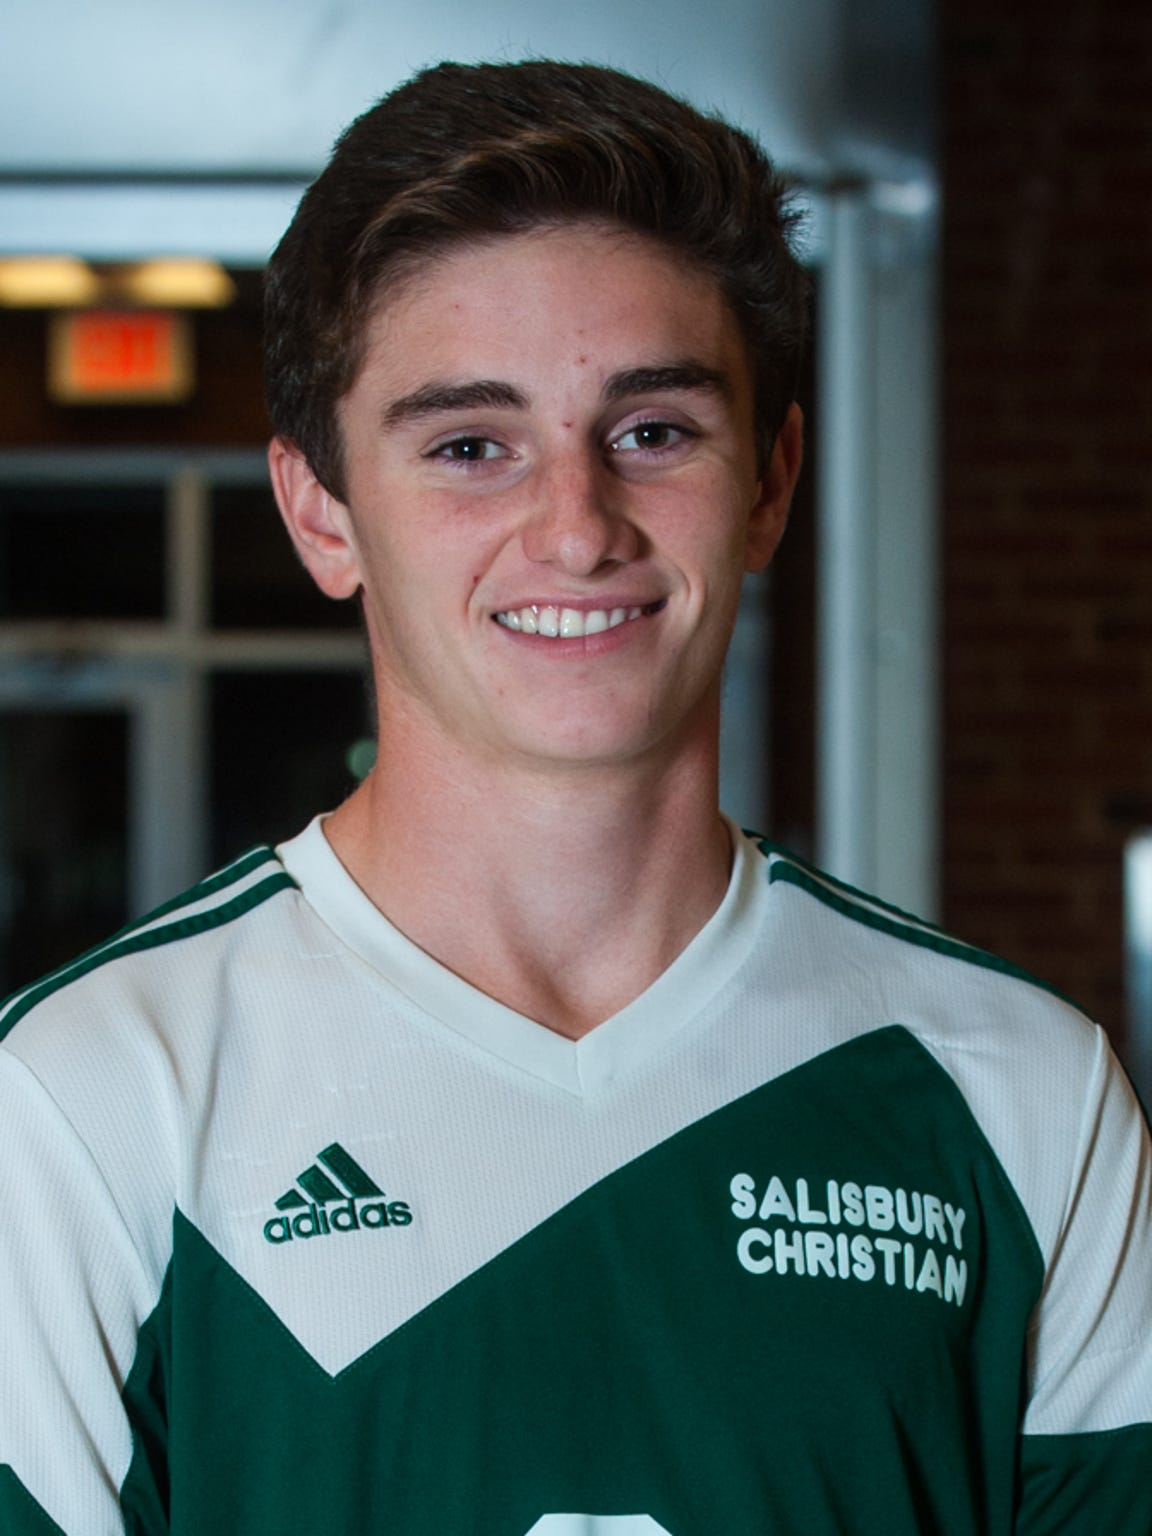 Salisbury Christian's Ryan Spadin.